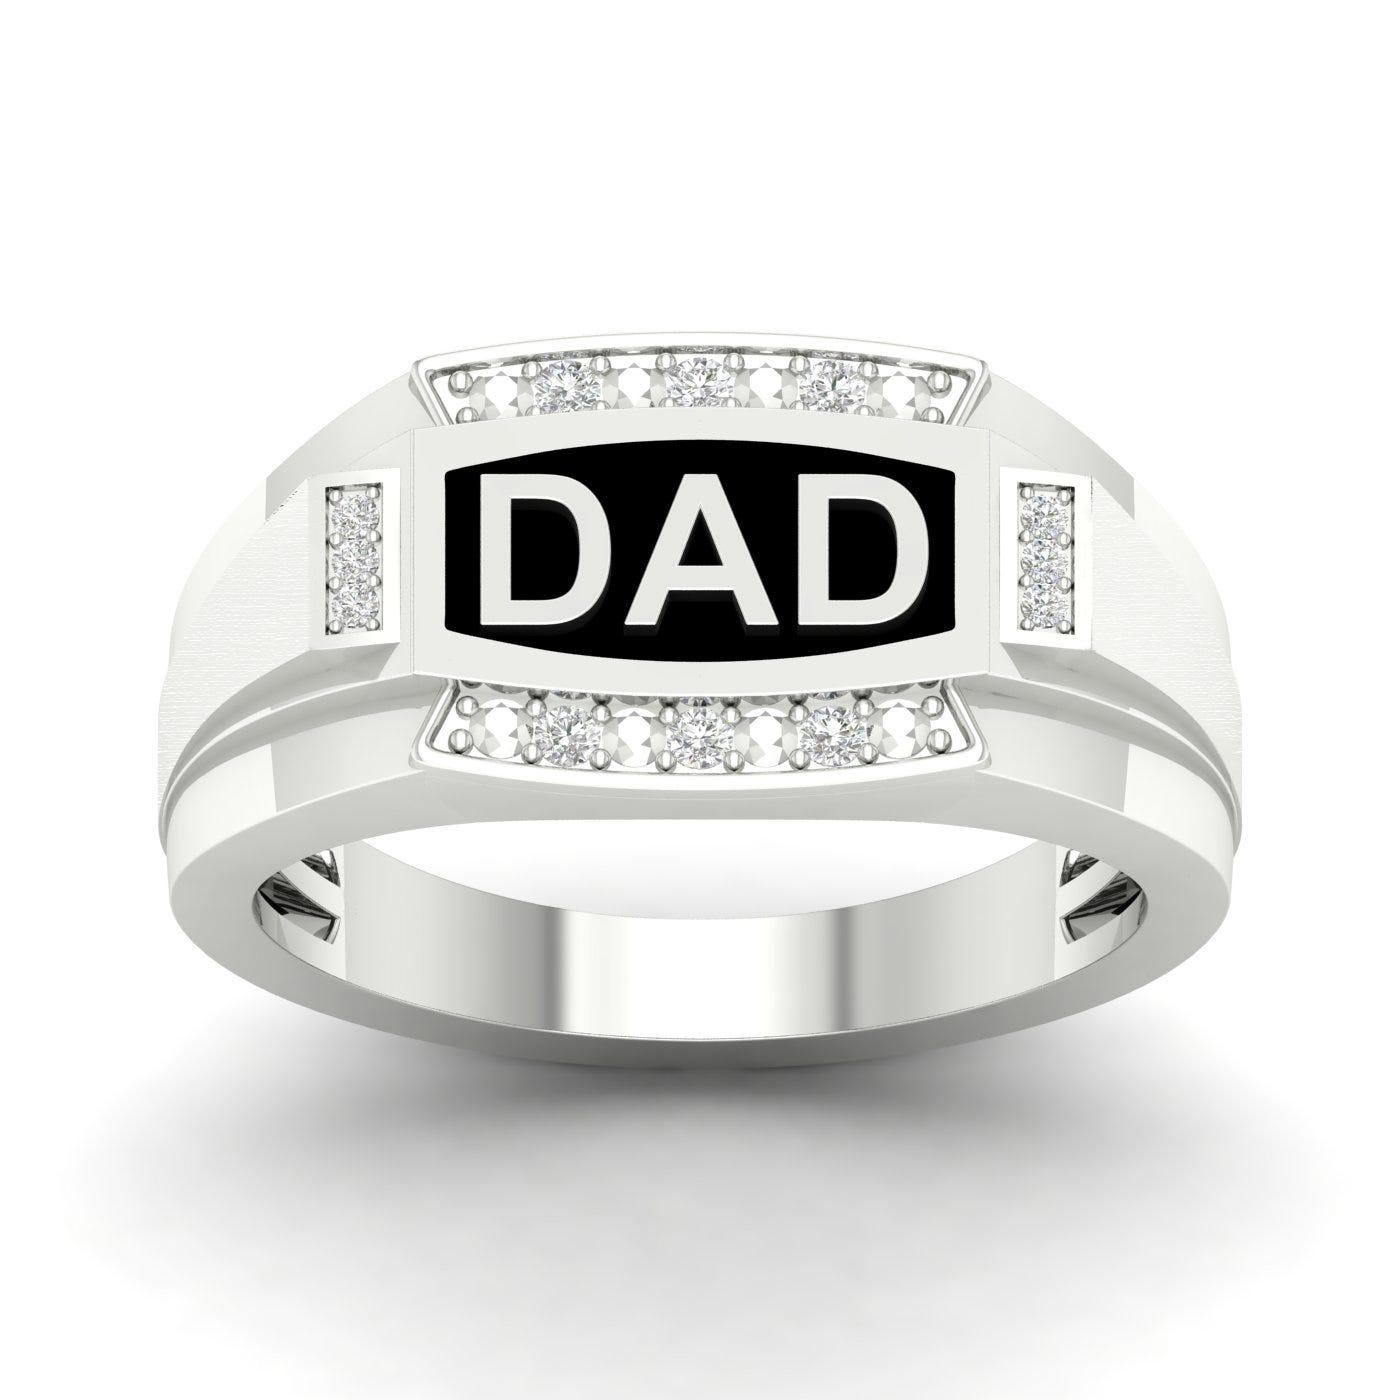 Gents Black Enamel & Diamond Dad Ring in 10k White Gold